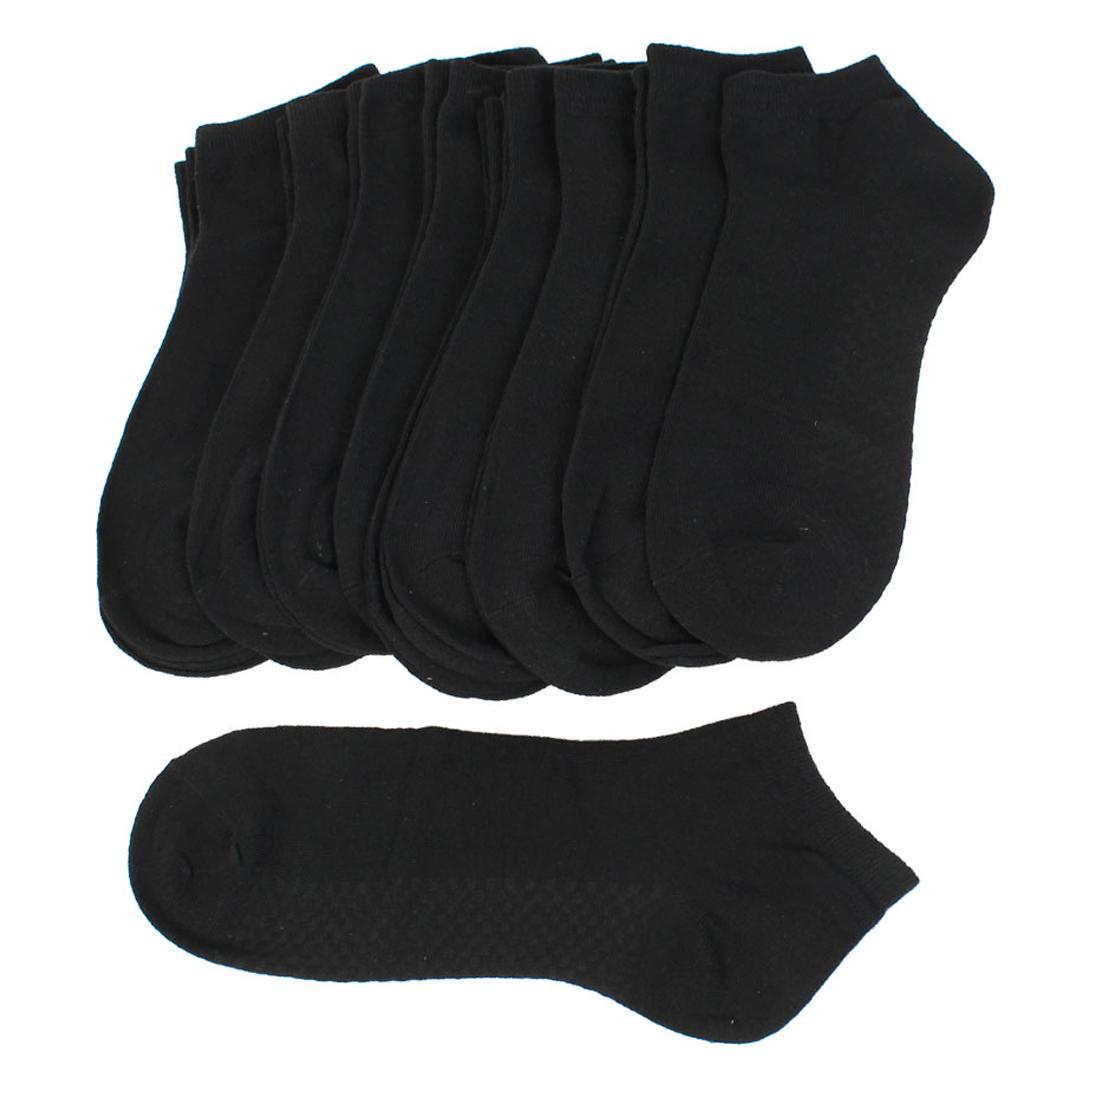 Men Black Stretchy Short Low Cut Running Socks 10 Pairs